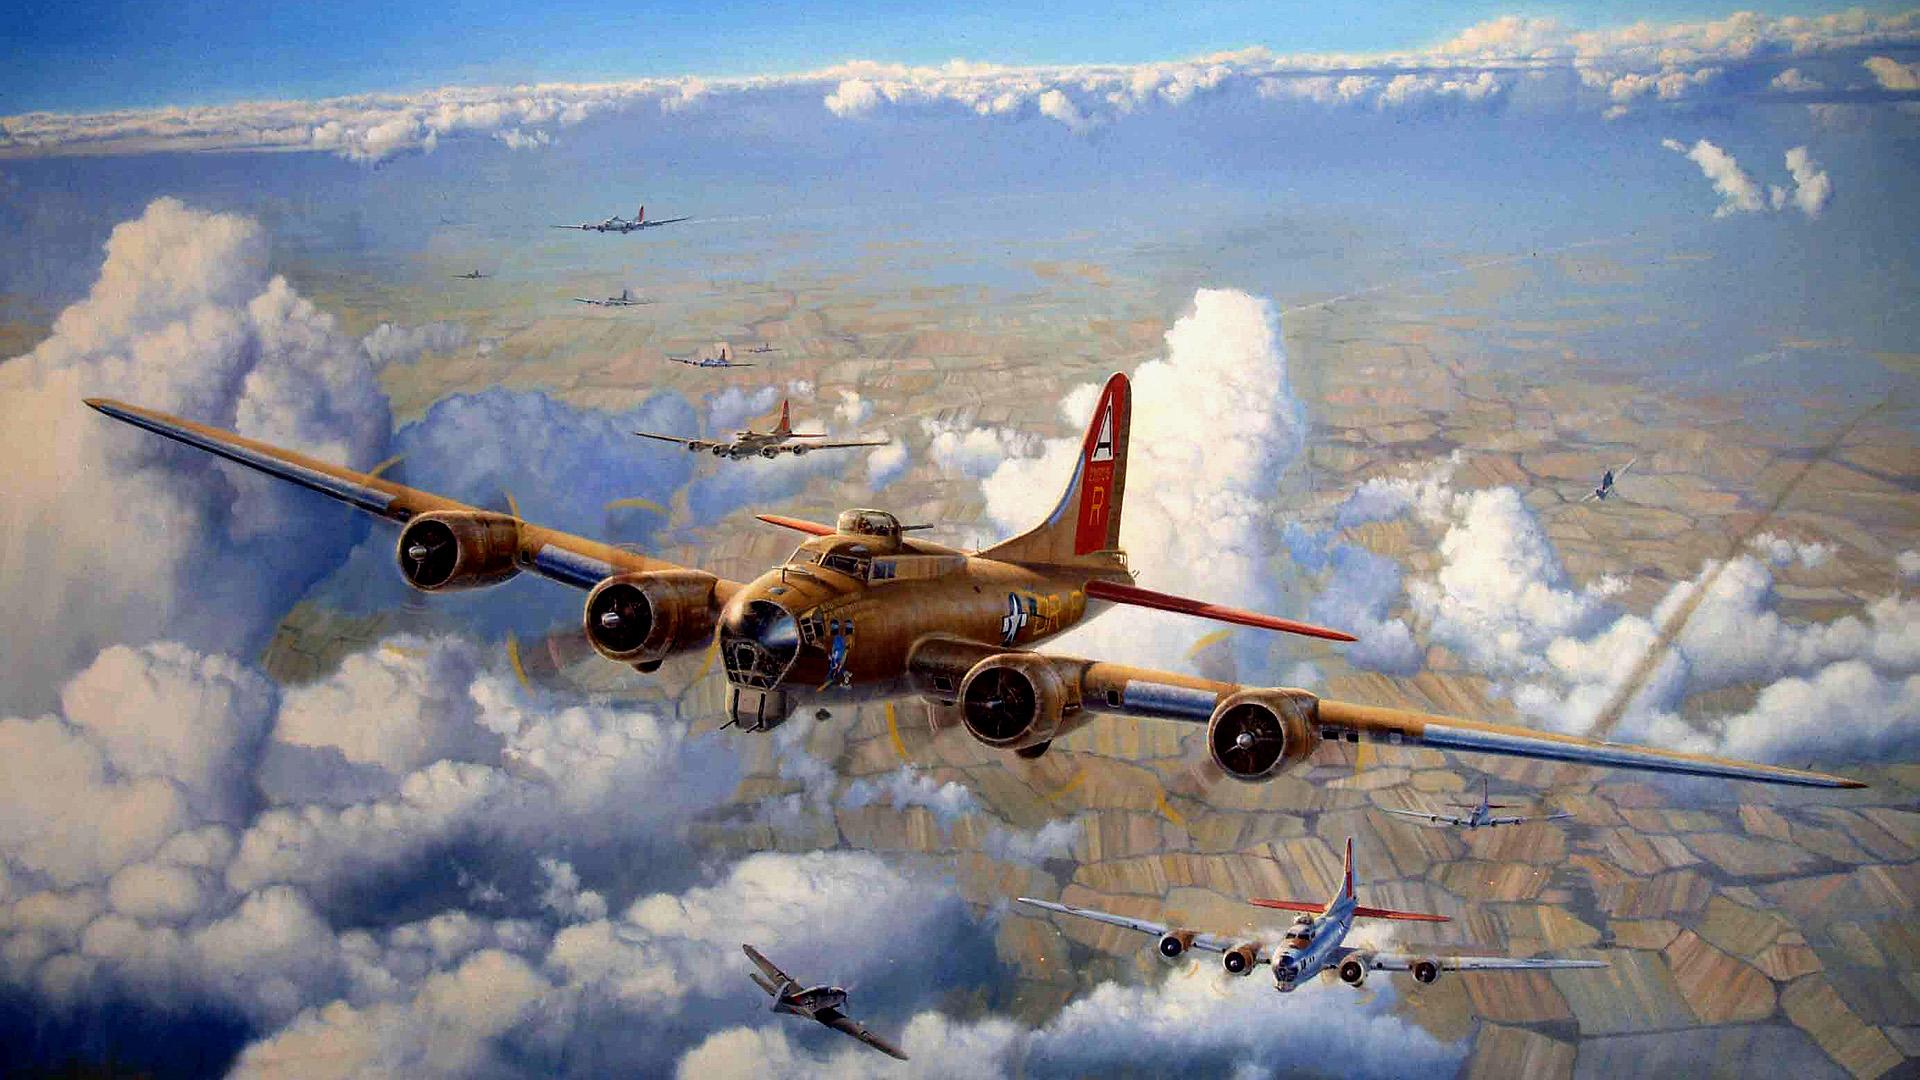 17 flying fortress artwork WW II wallpaper   ForWallpapercom 1920x1080